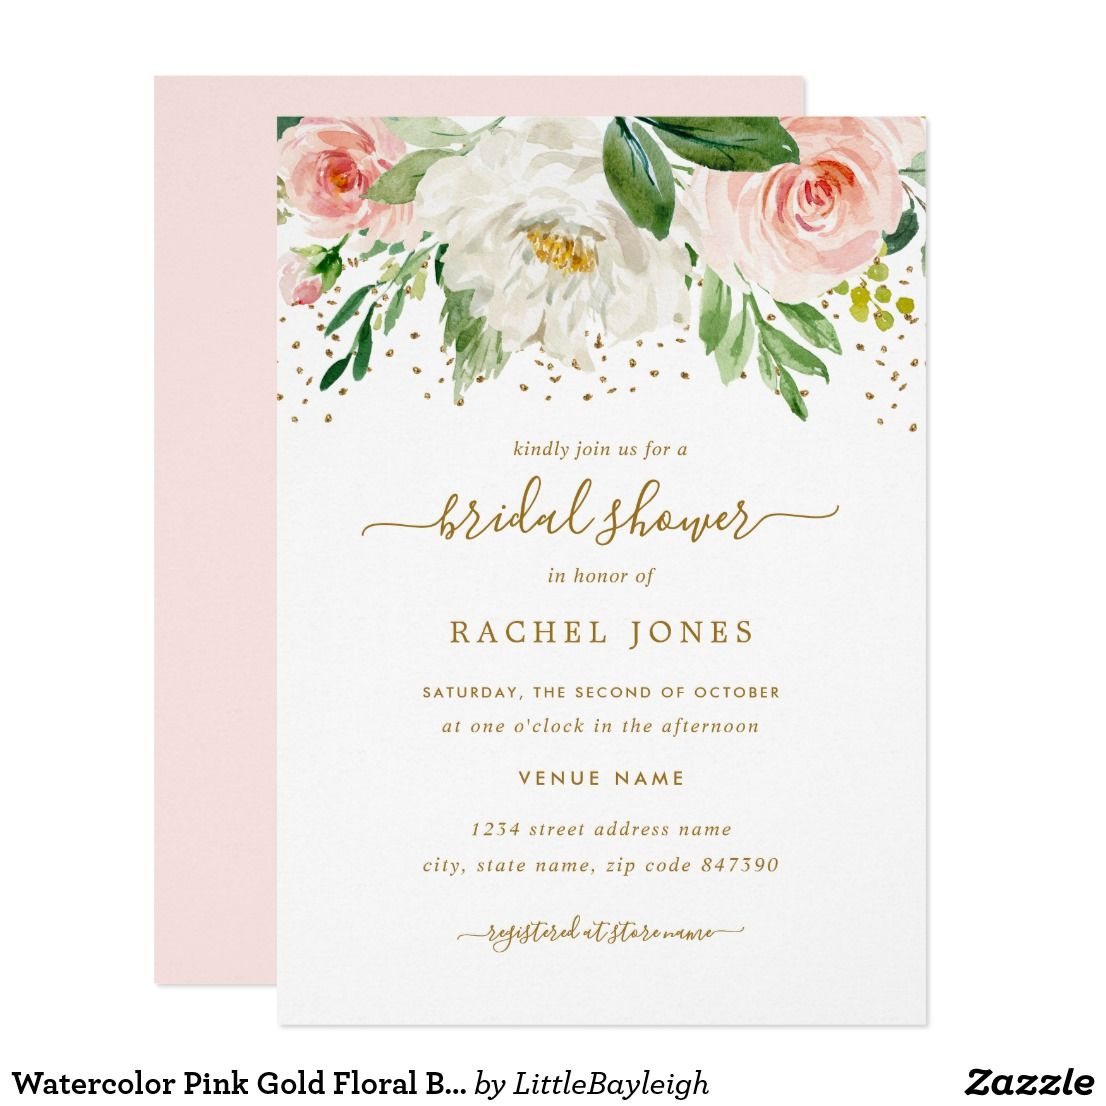 Watercolor Pink Gold Floral Bridal Shower Invitation Zazzle Com In 2020 Floral Wedding Invitations Blush Gold Wedding Invitations Floral Bridal Shower Invitations